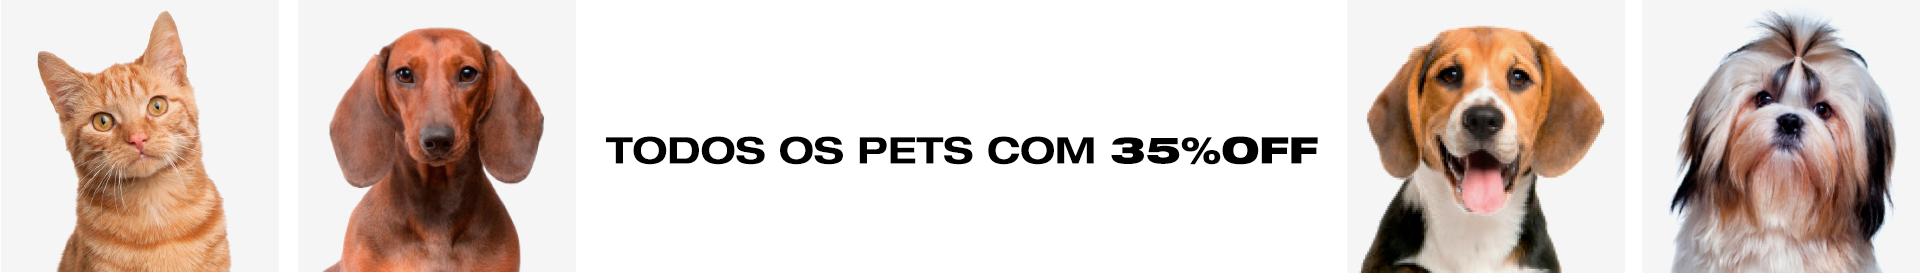 cab-pets